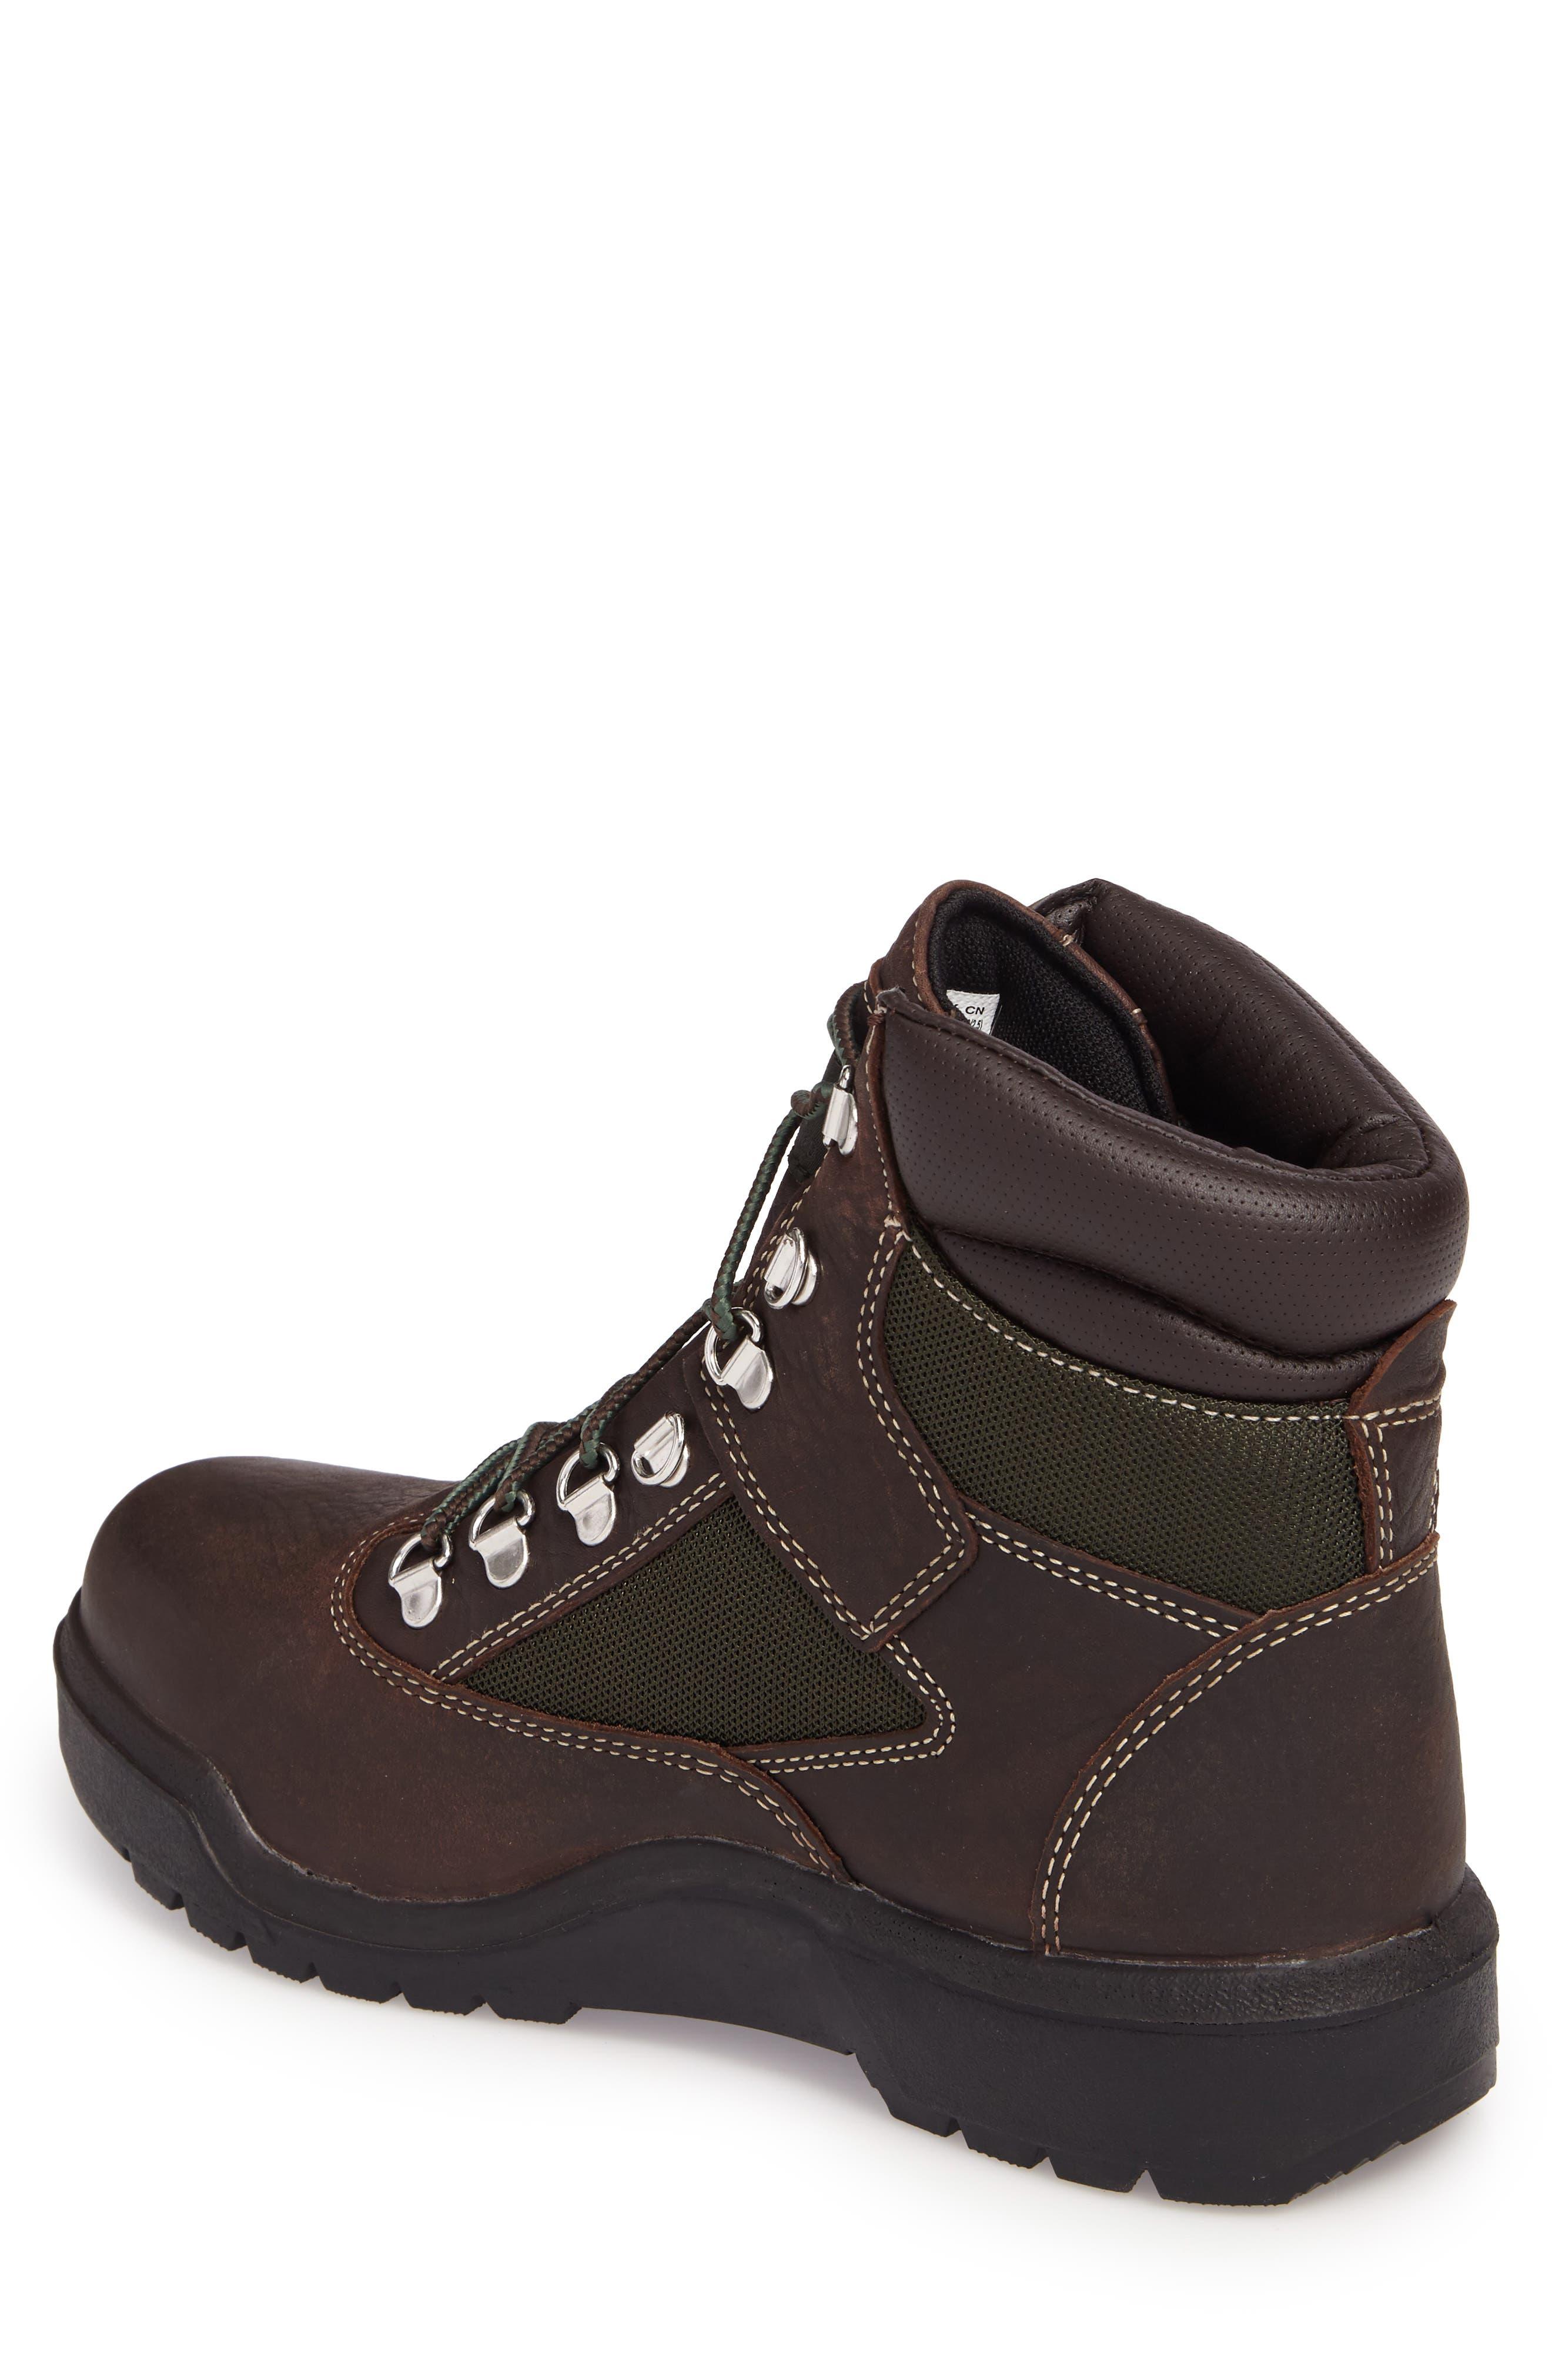 Field Waterproof Winter Boot,                             Alternate thumbnail 2, color,                             201